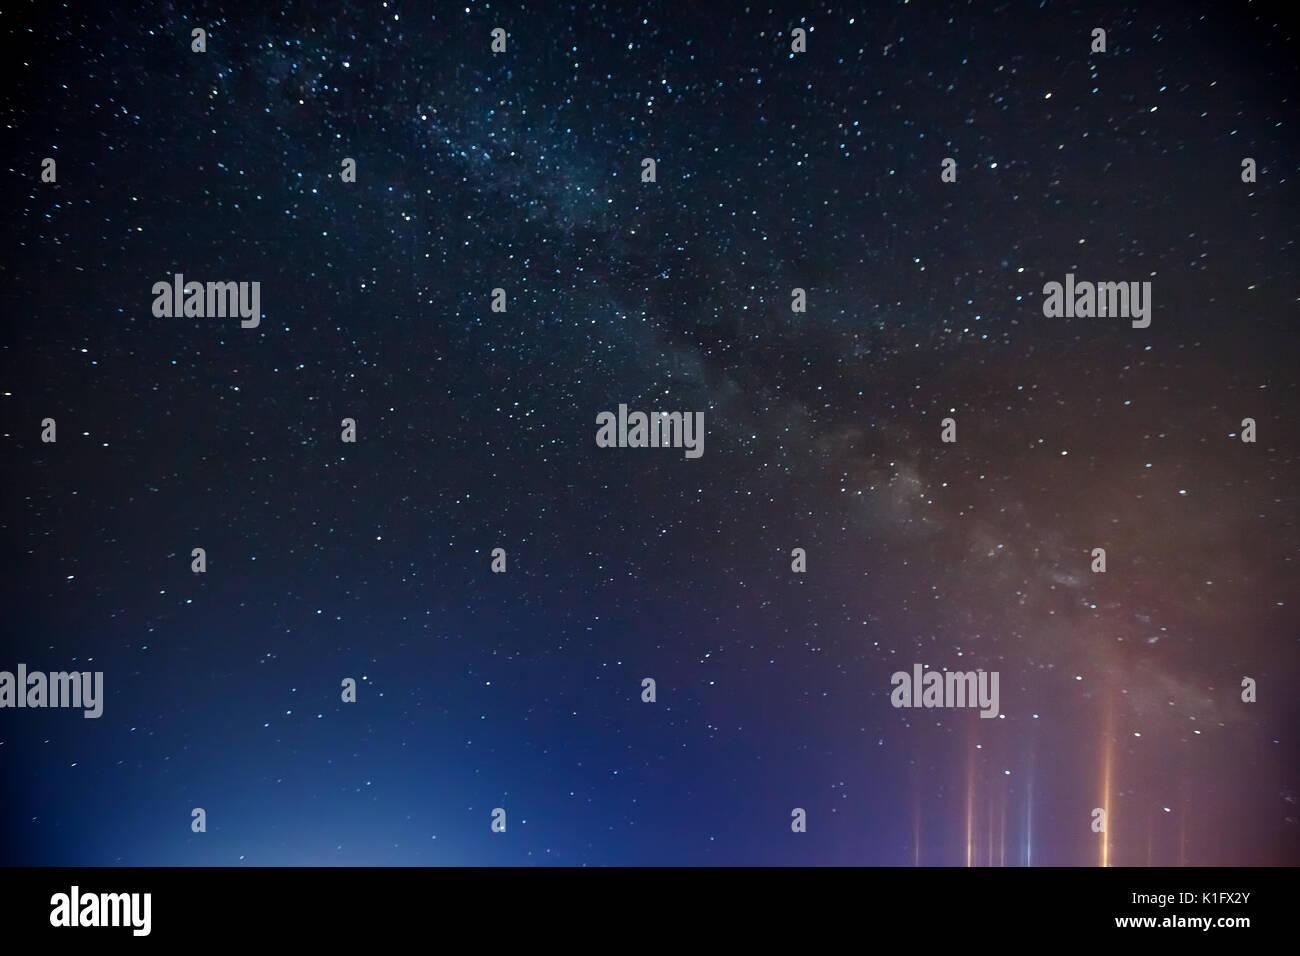 Night sky with lot of shiny stars, - Stock Image